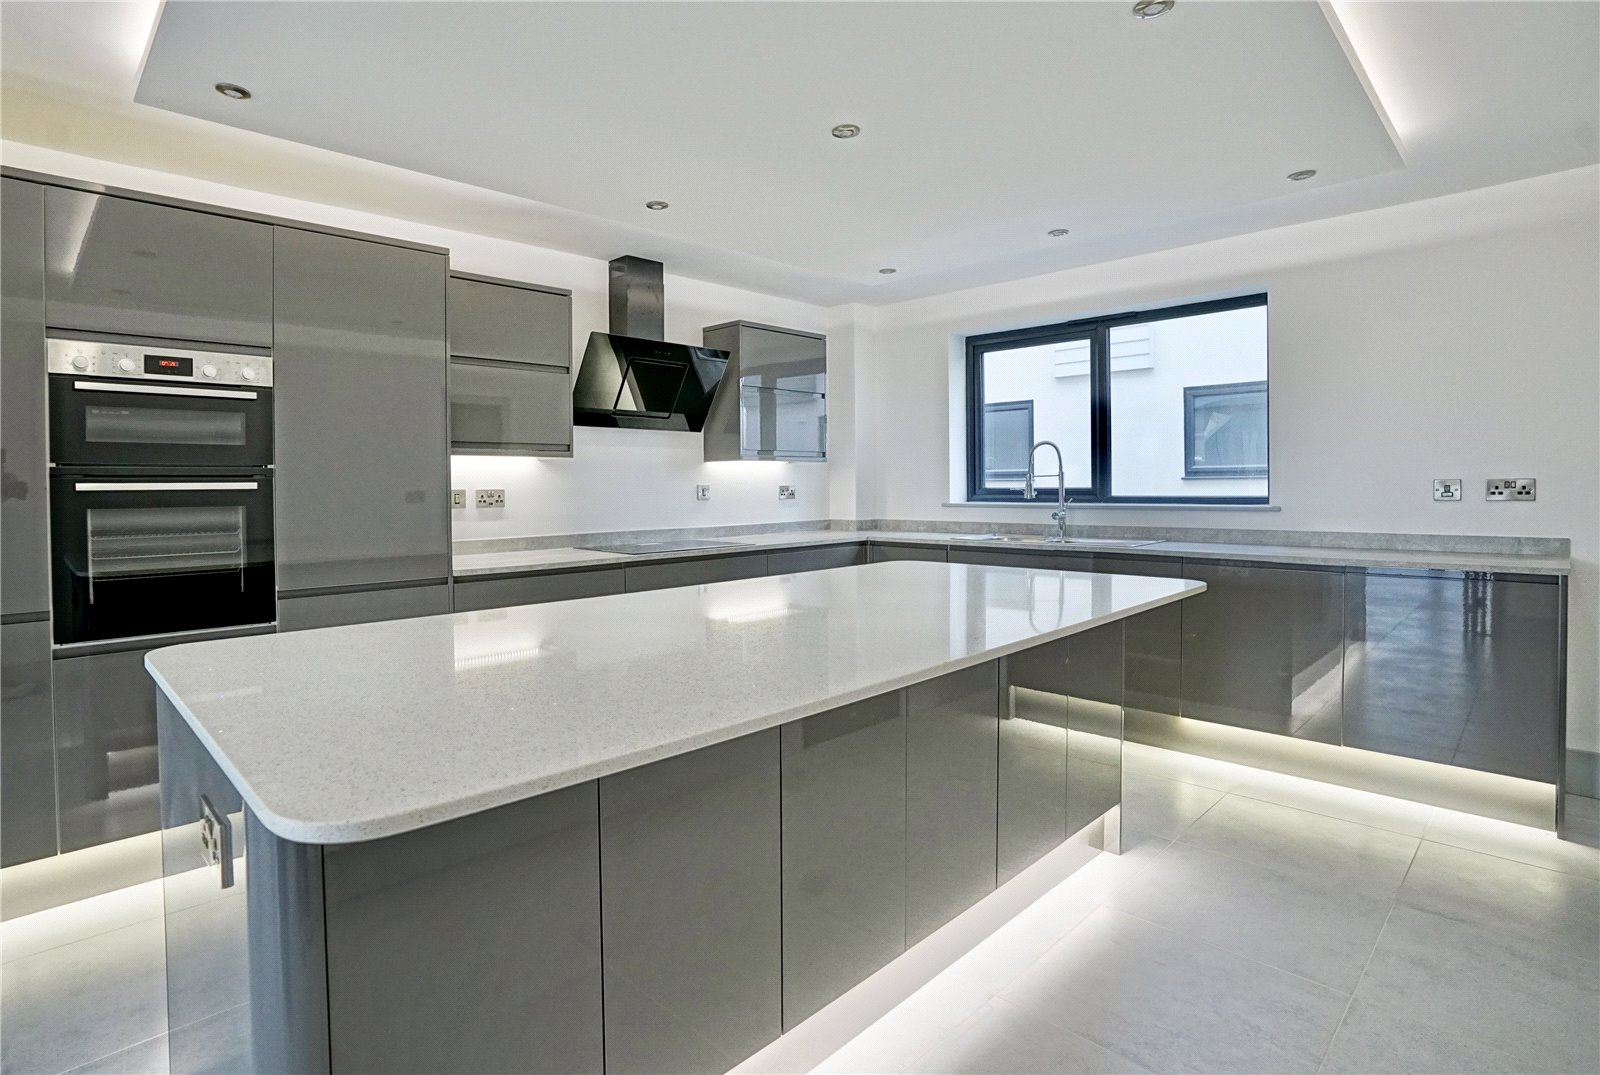 5 bed house for sale in The Range, Eynesbury Hardwicke  - Property Image 2